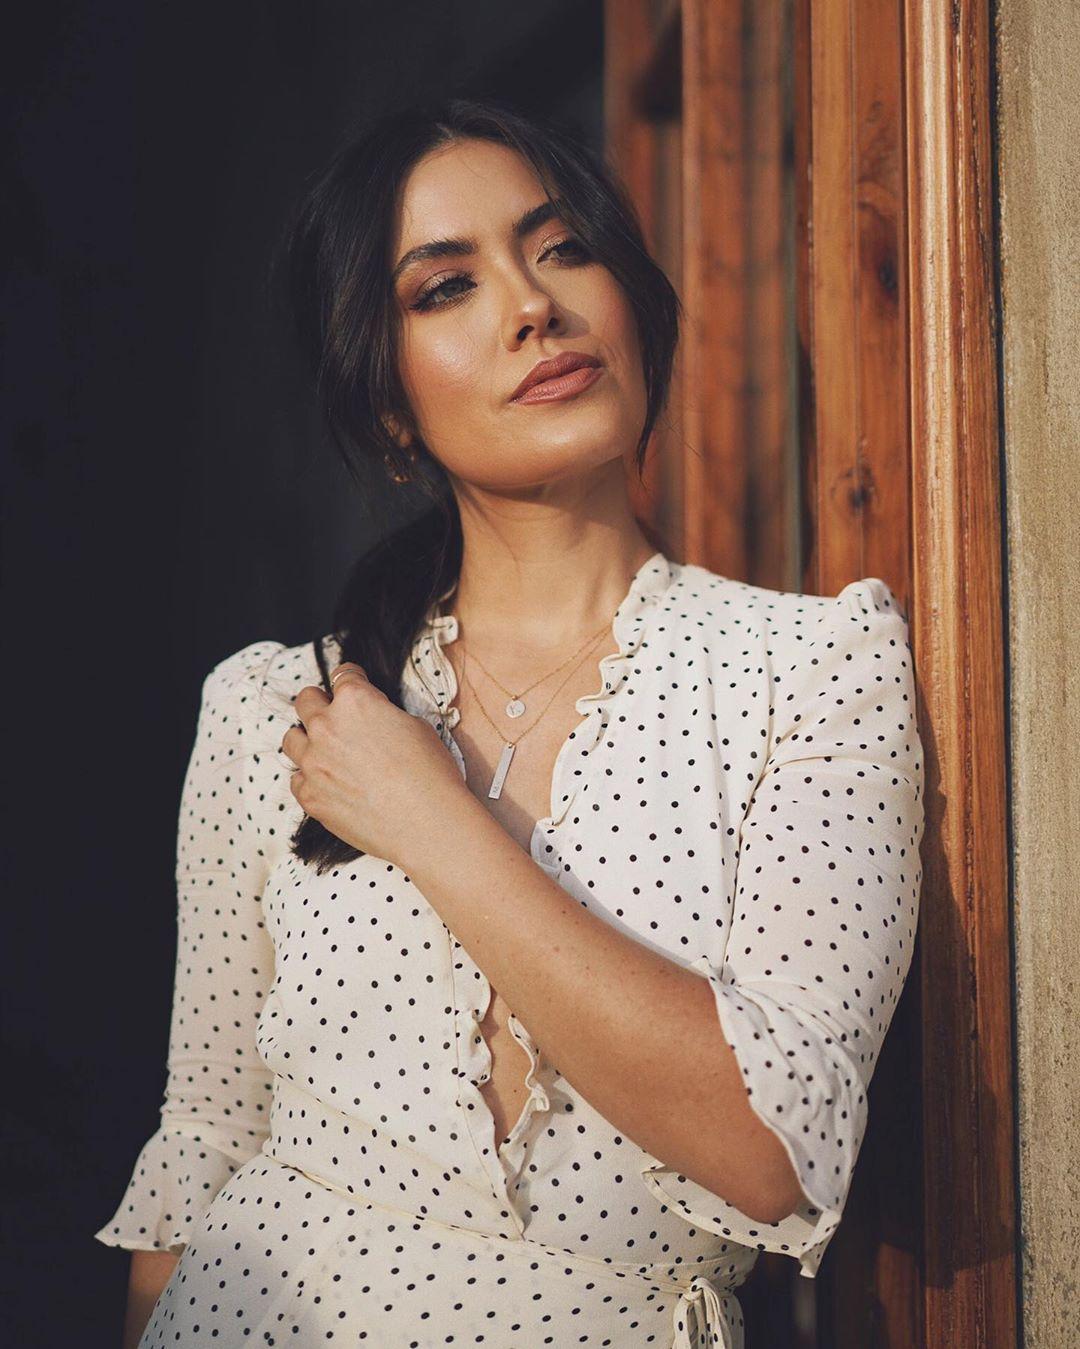 Melissa-Alatorre-Wallpapers-Insta-Fit-Bio-3